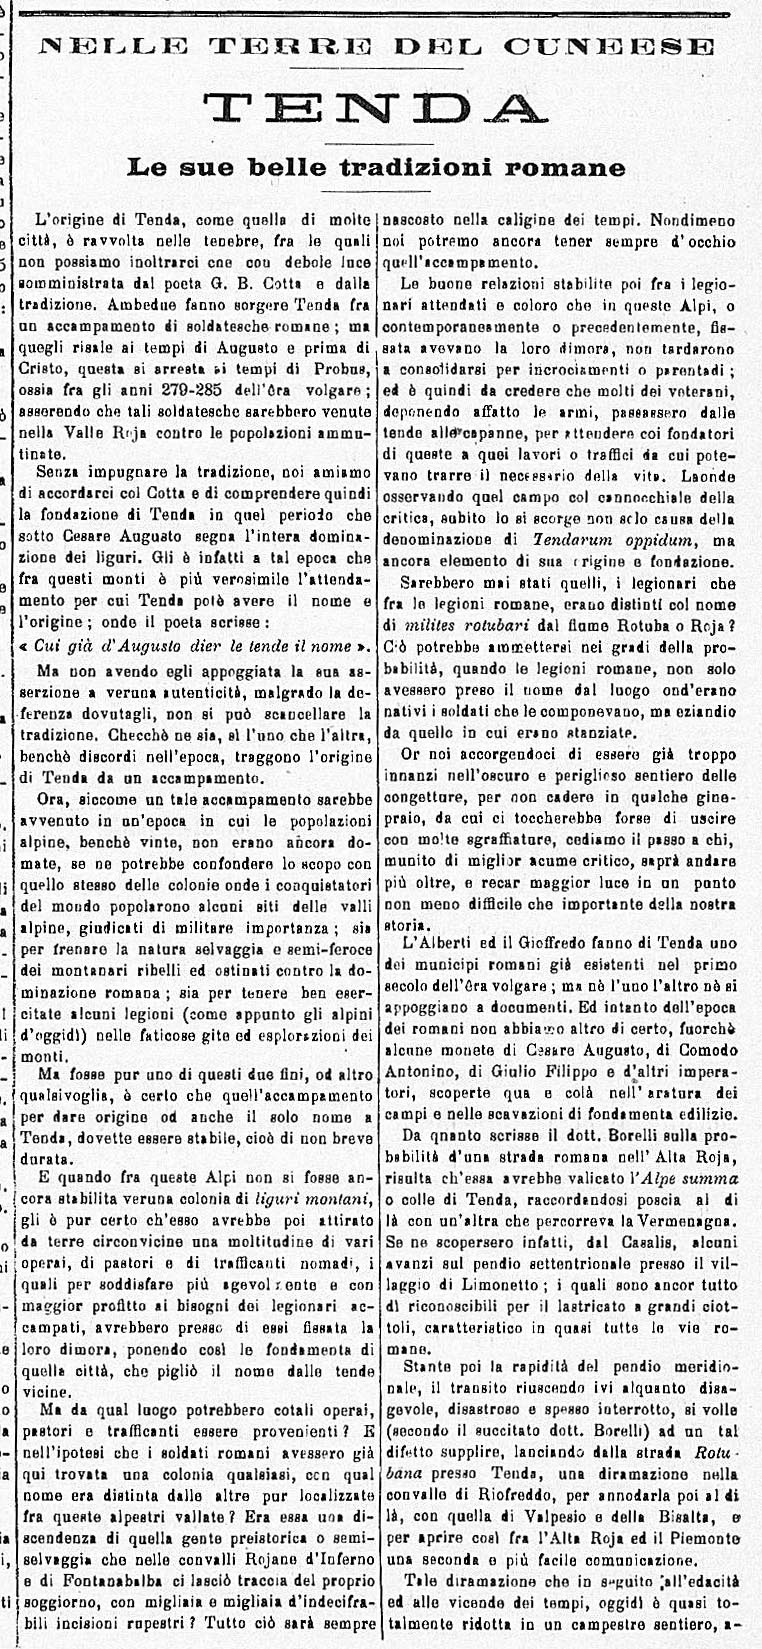 195 du 23 8 1911